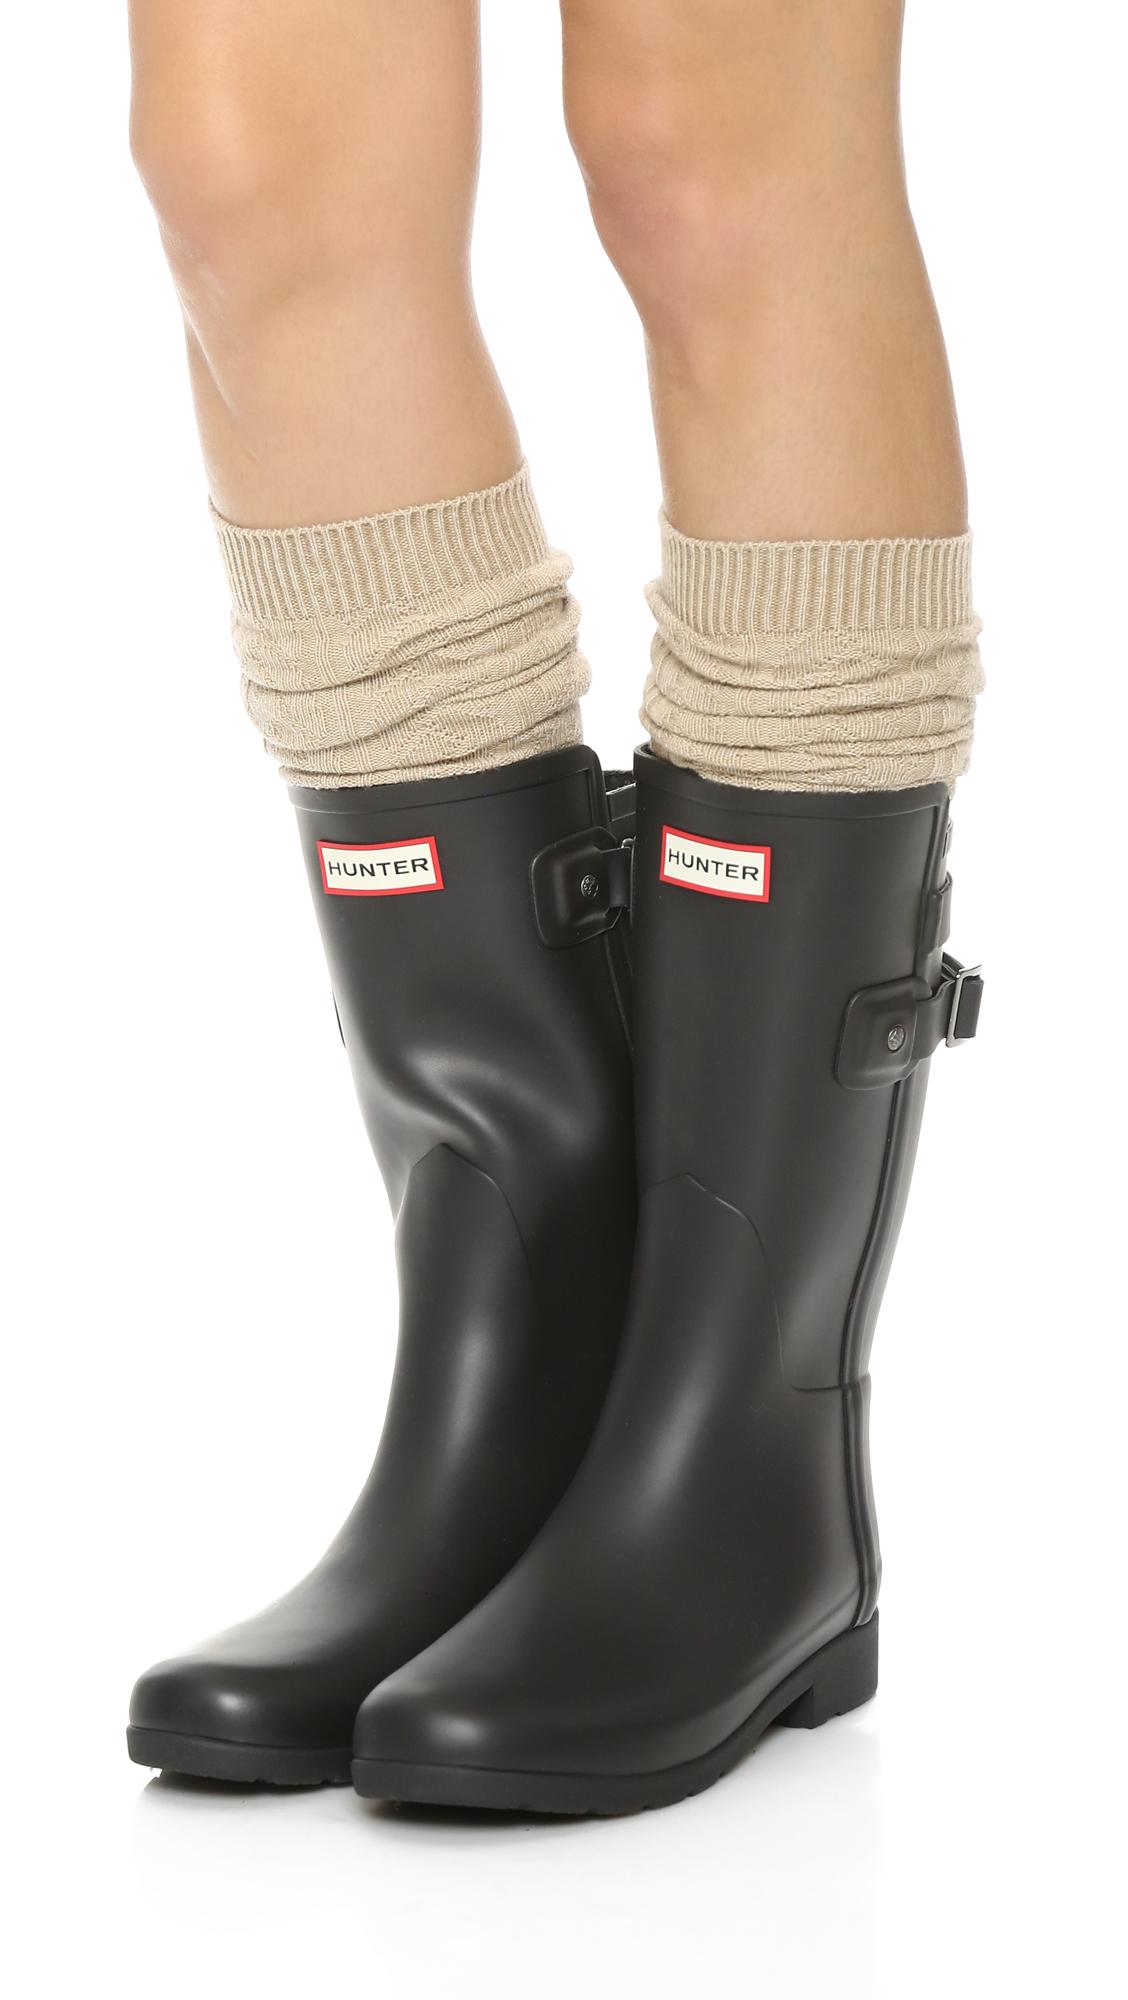 Hunter Original Refined Back Strap Short Gloss Boot grUlOE24o